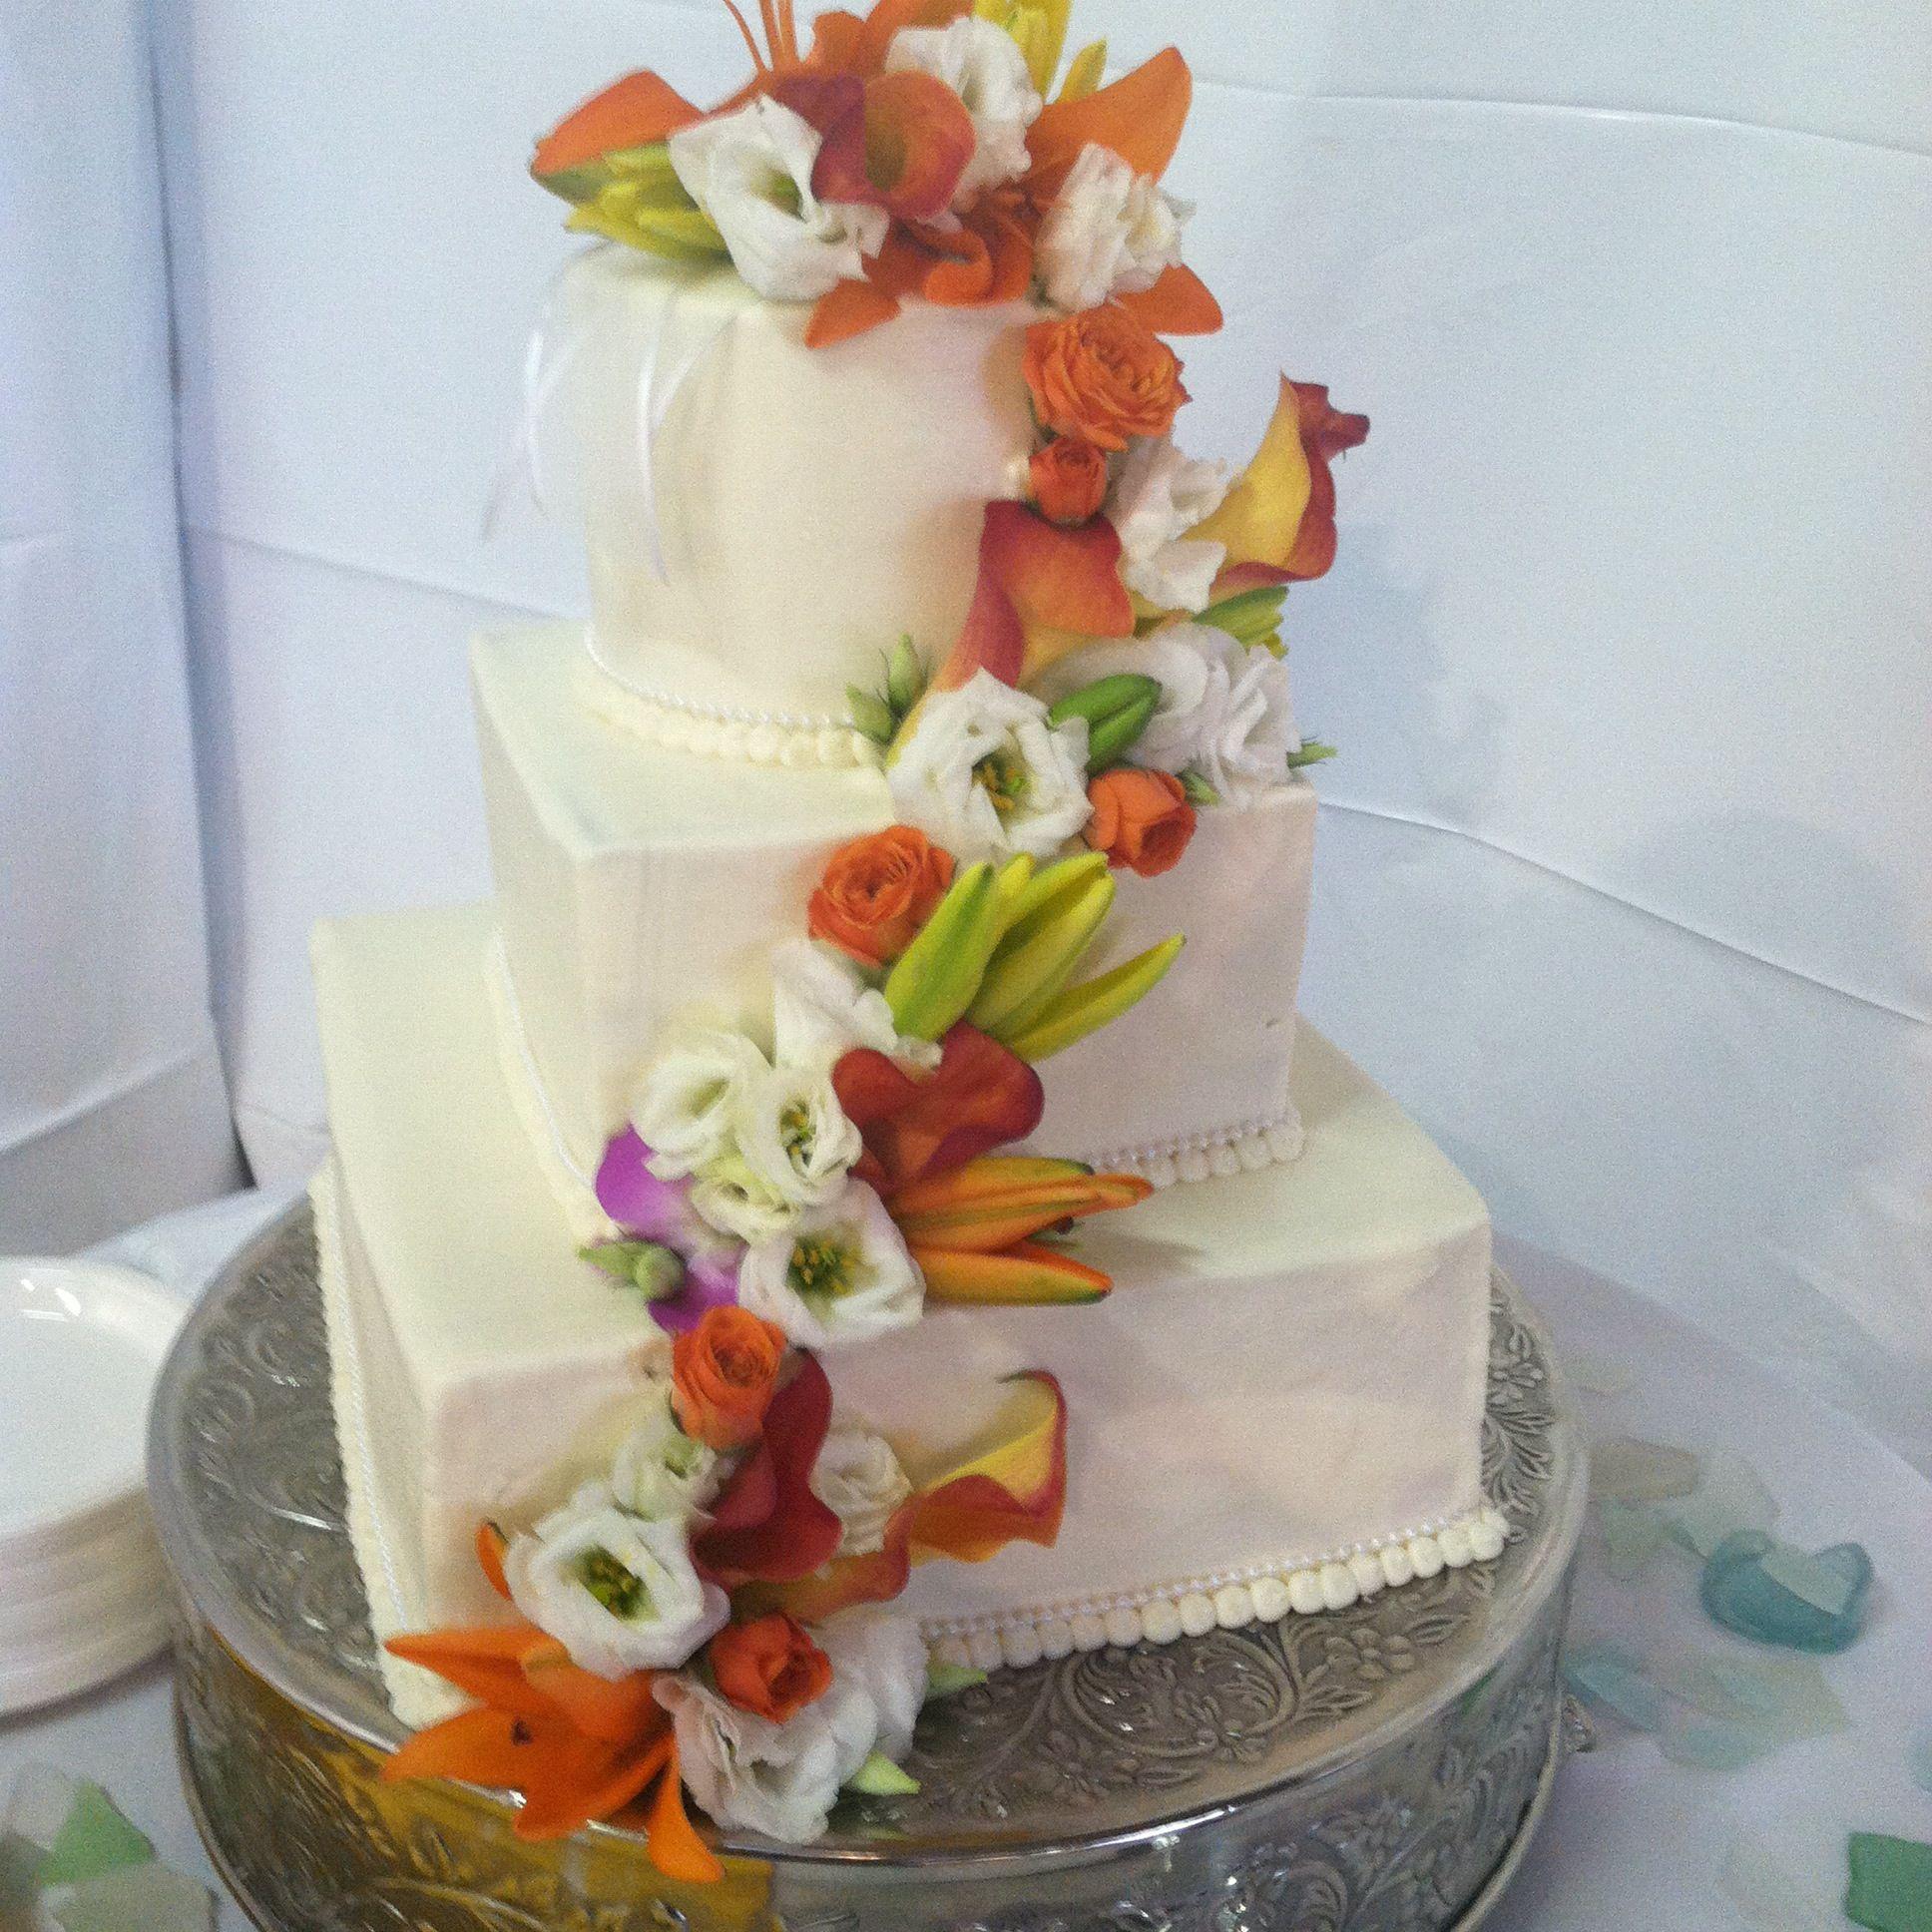 Simply Gourmet Wedding Cake Easton MD Parties Celebrations Sp